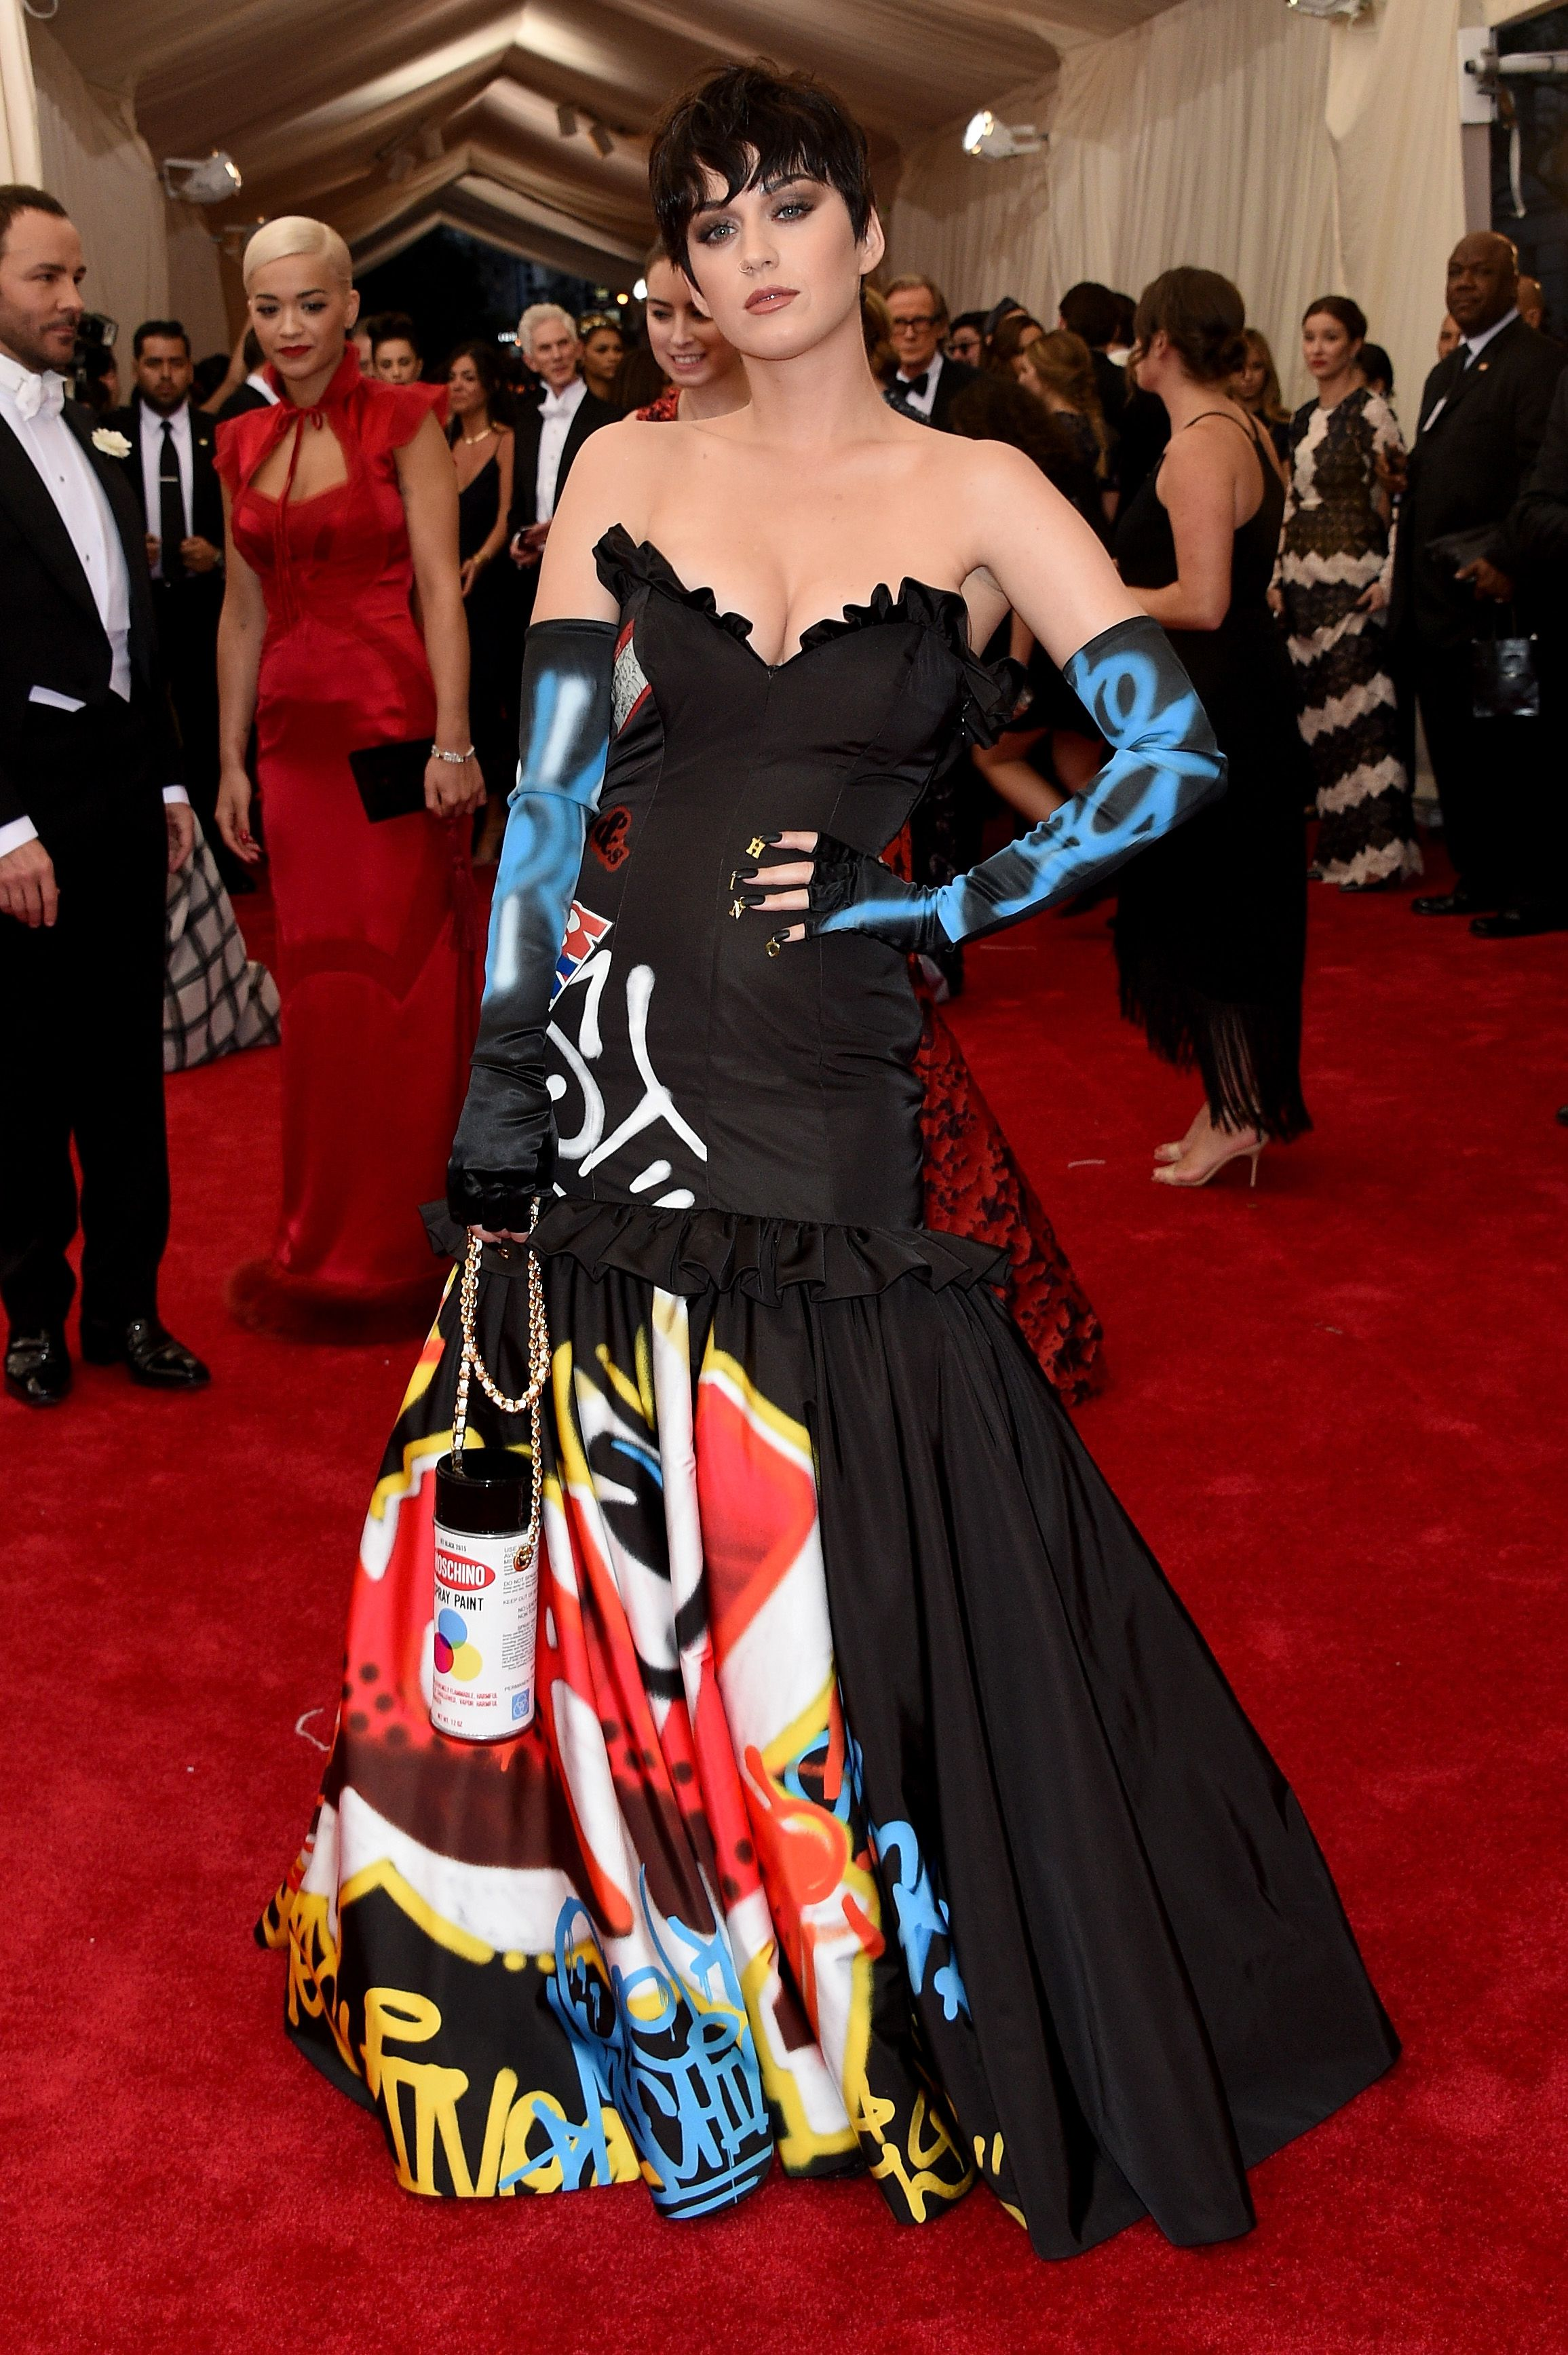 Tapete vermelho: todos os looks do Met Gala 2015 - Katy Perry